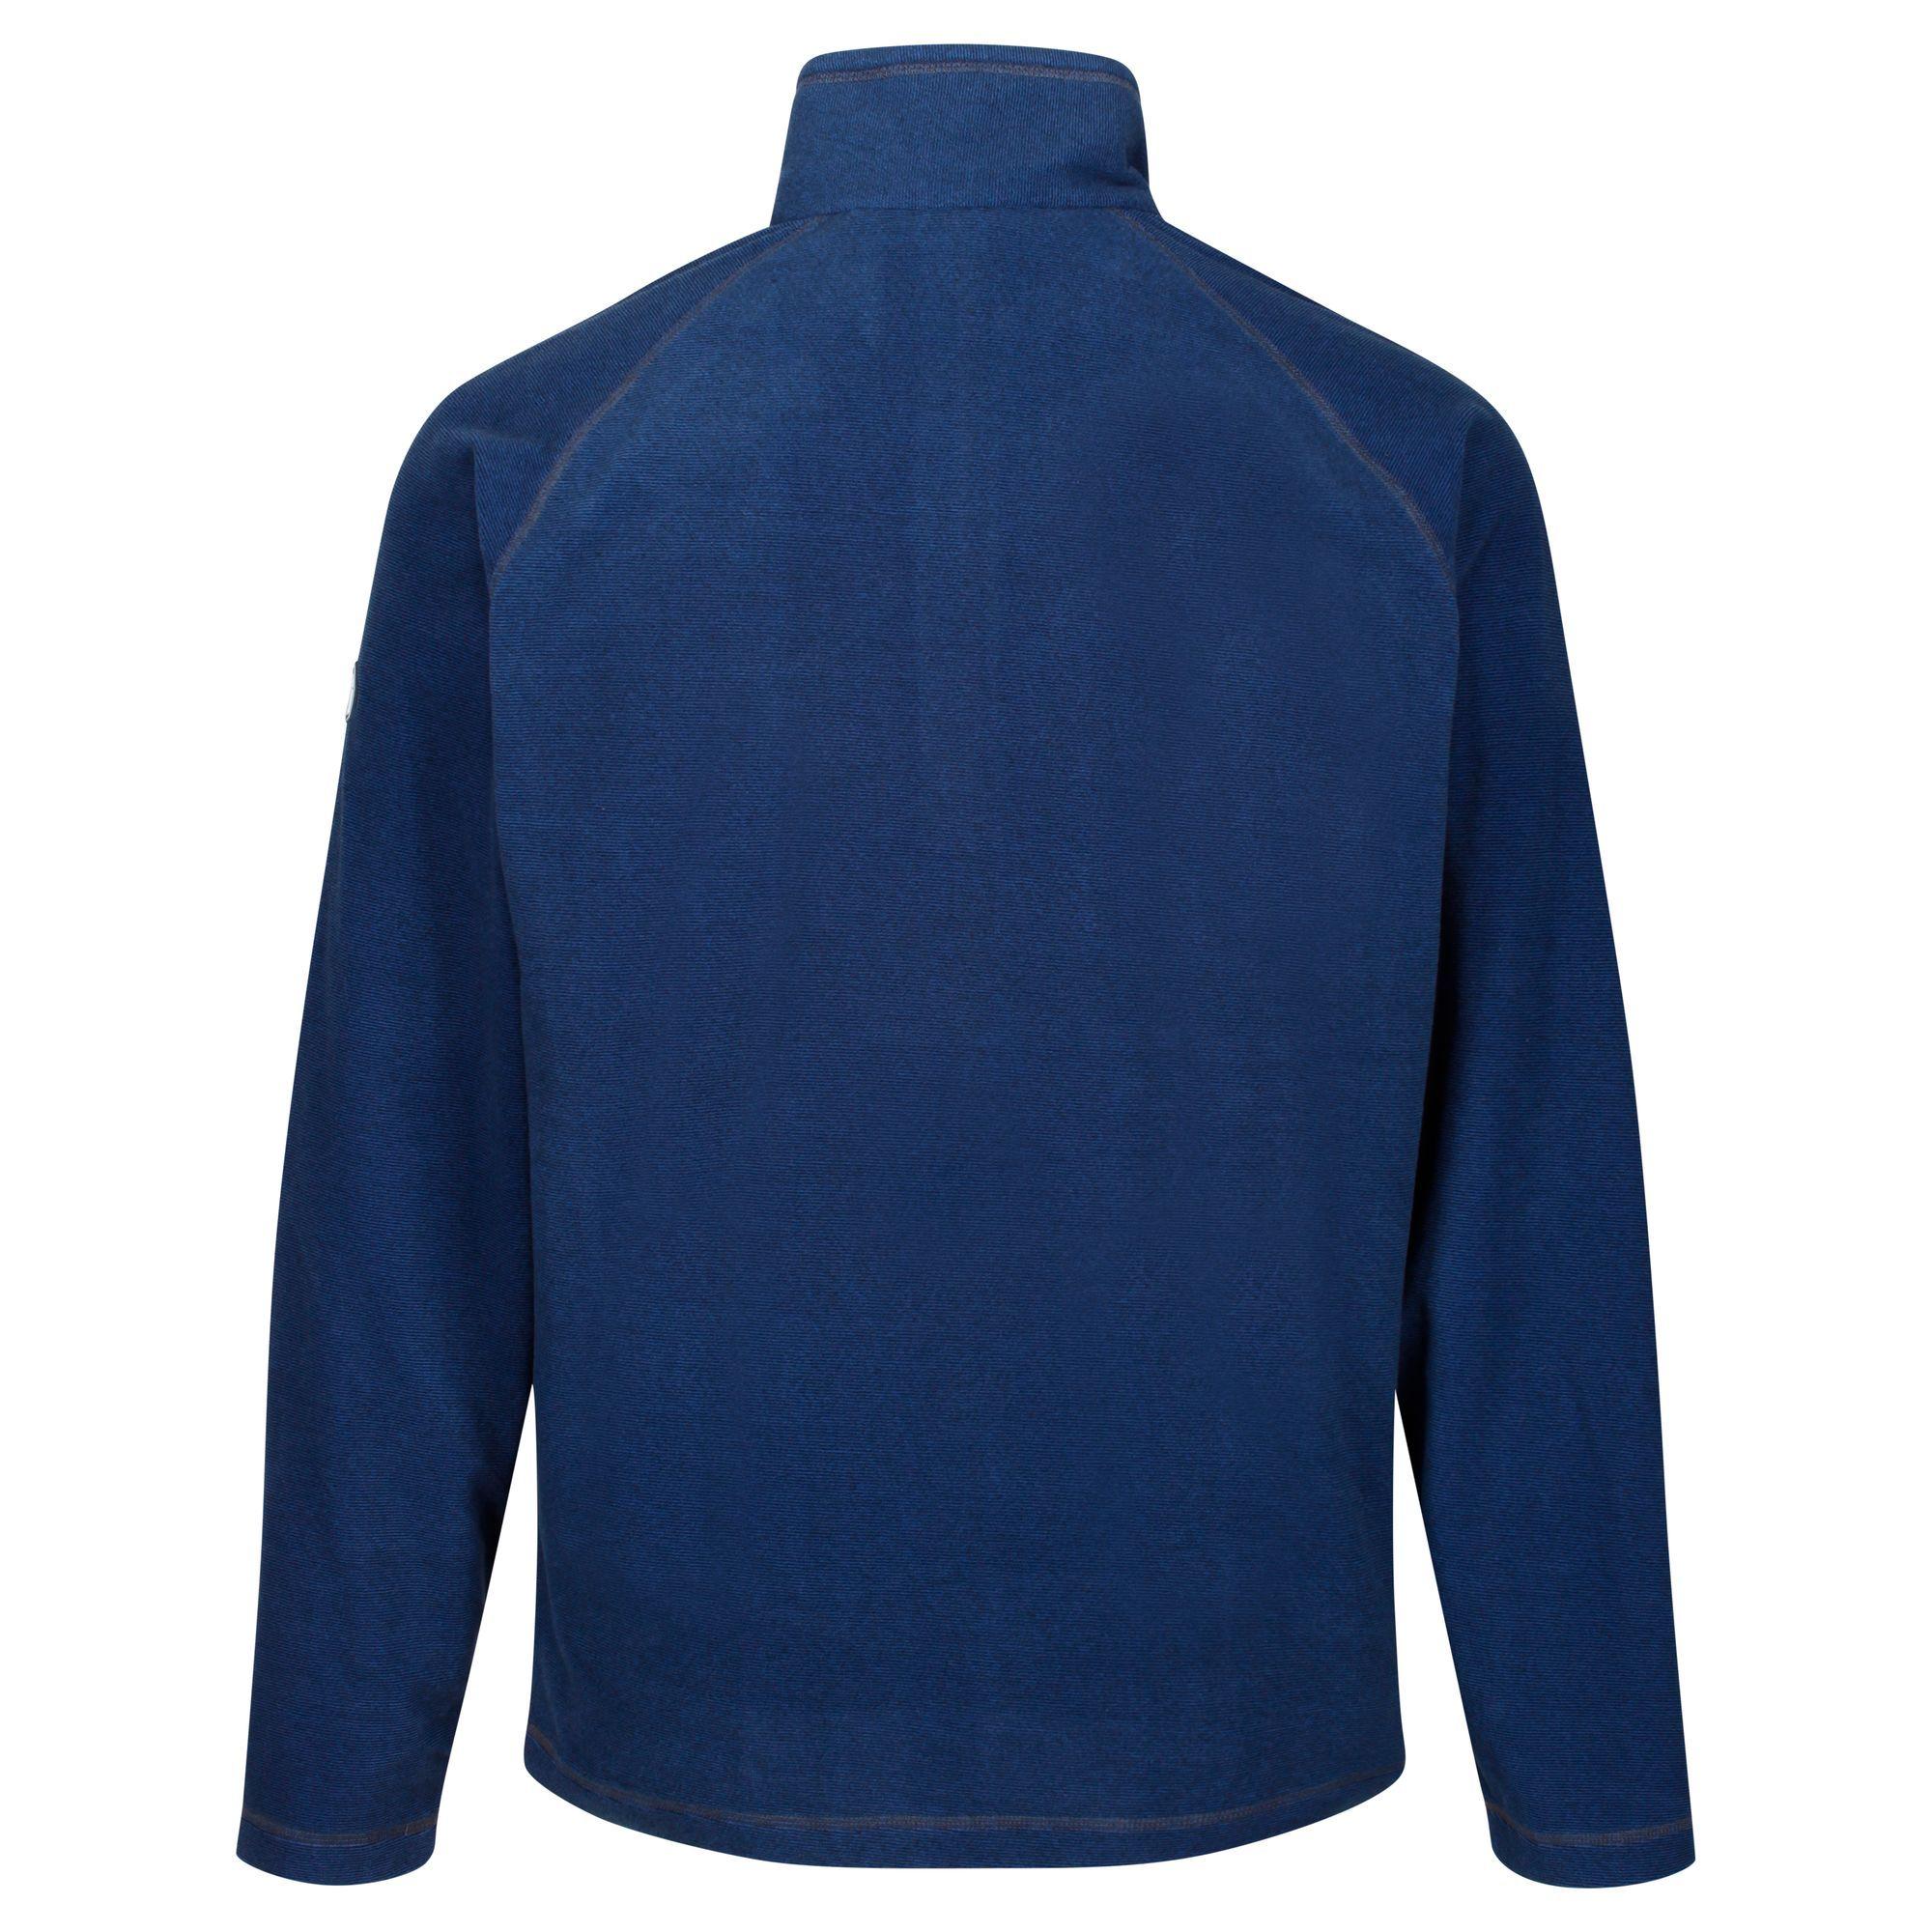 Regatta-Mens-Fleece-Jacket-amp-Hoodie-Massive-Clearance-RRP-60 thumbnail 58